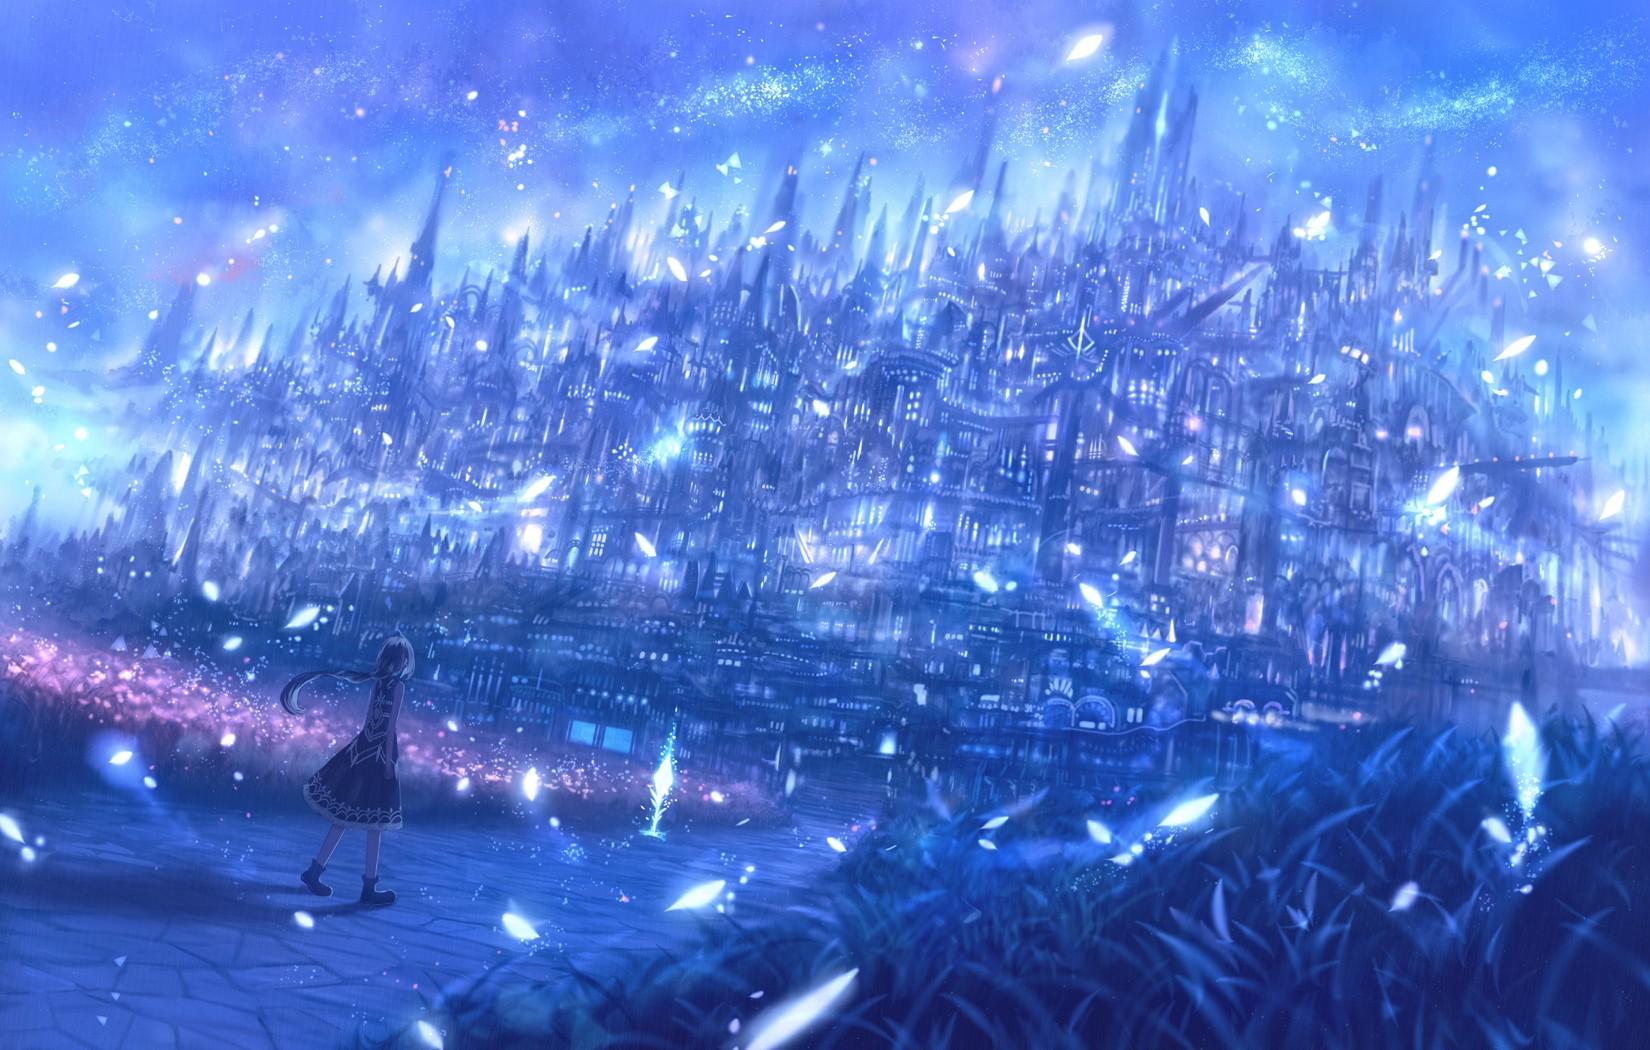 Anime Girl Looking At Sky Wallpaper 배경 화면 1650x1050 픽셀 건물 판타지 아트 잔디 마법 1650x1050